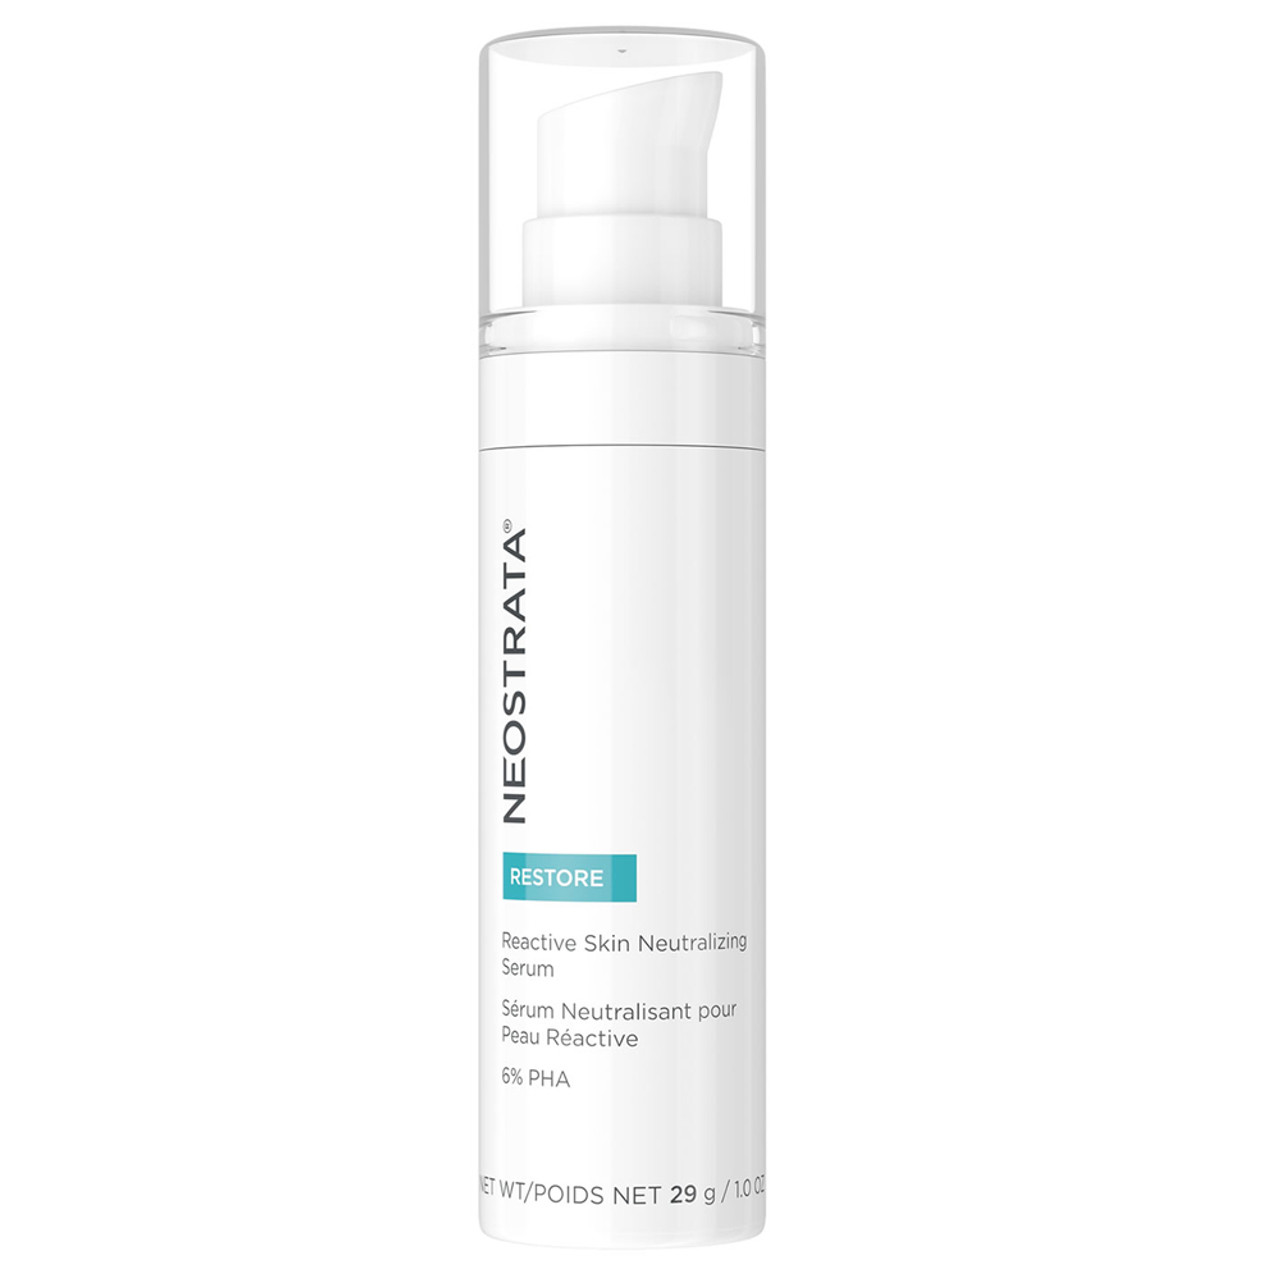 NeoStrata Reactive Skin Neutralizing Serum